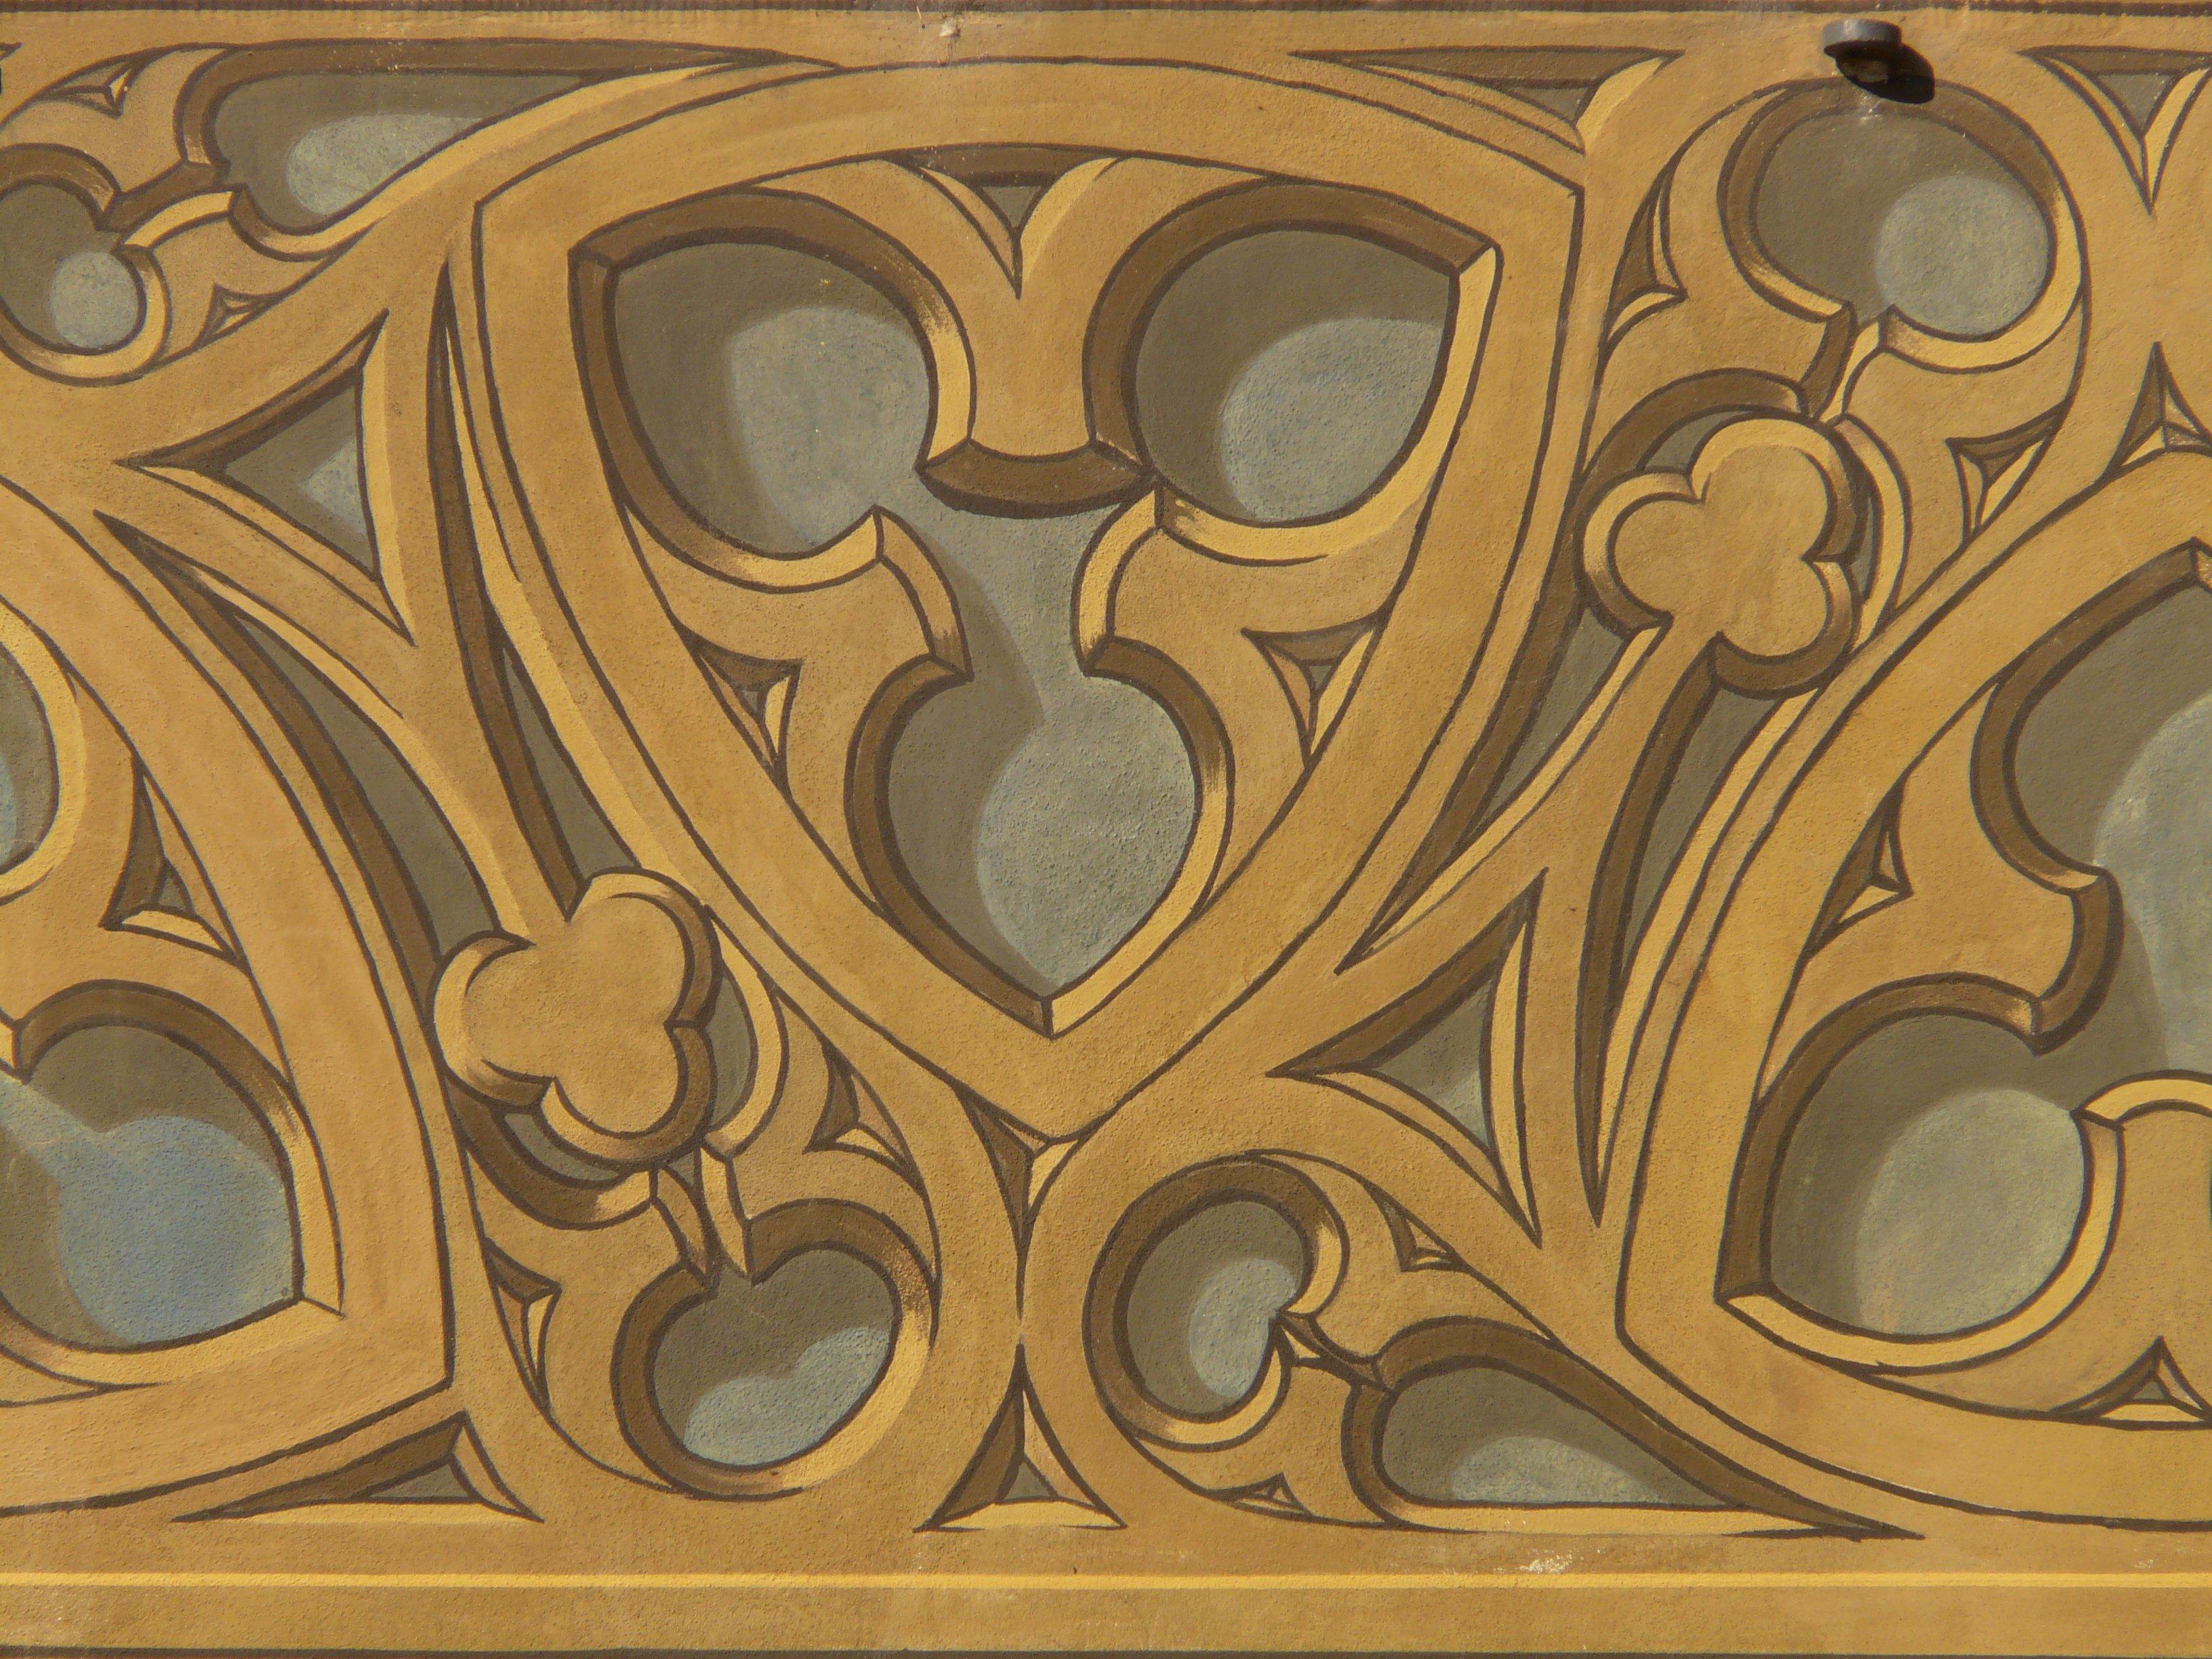 Gambar Kayu Pola Simbol Lingkaran Lukisan Ornamen